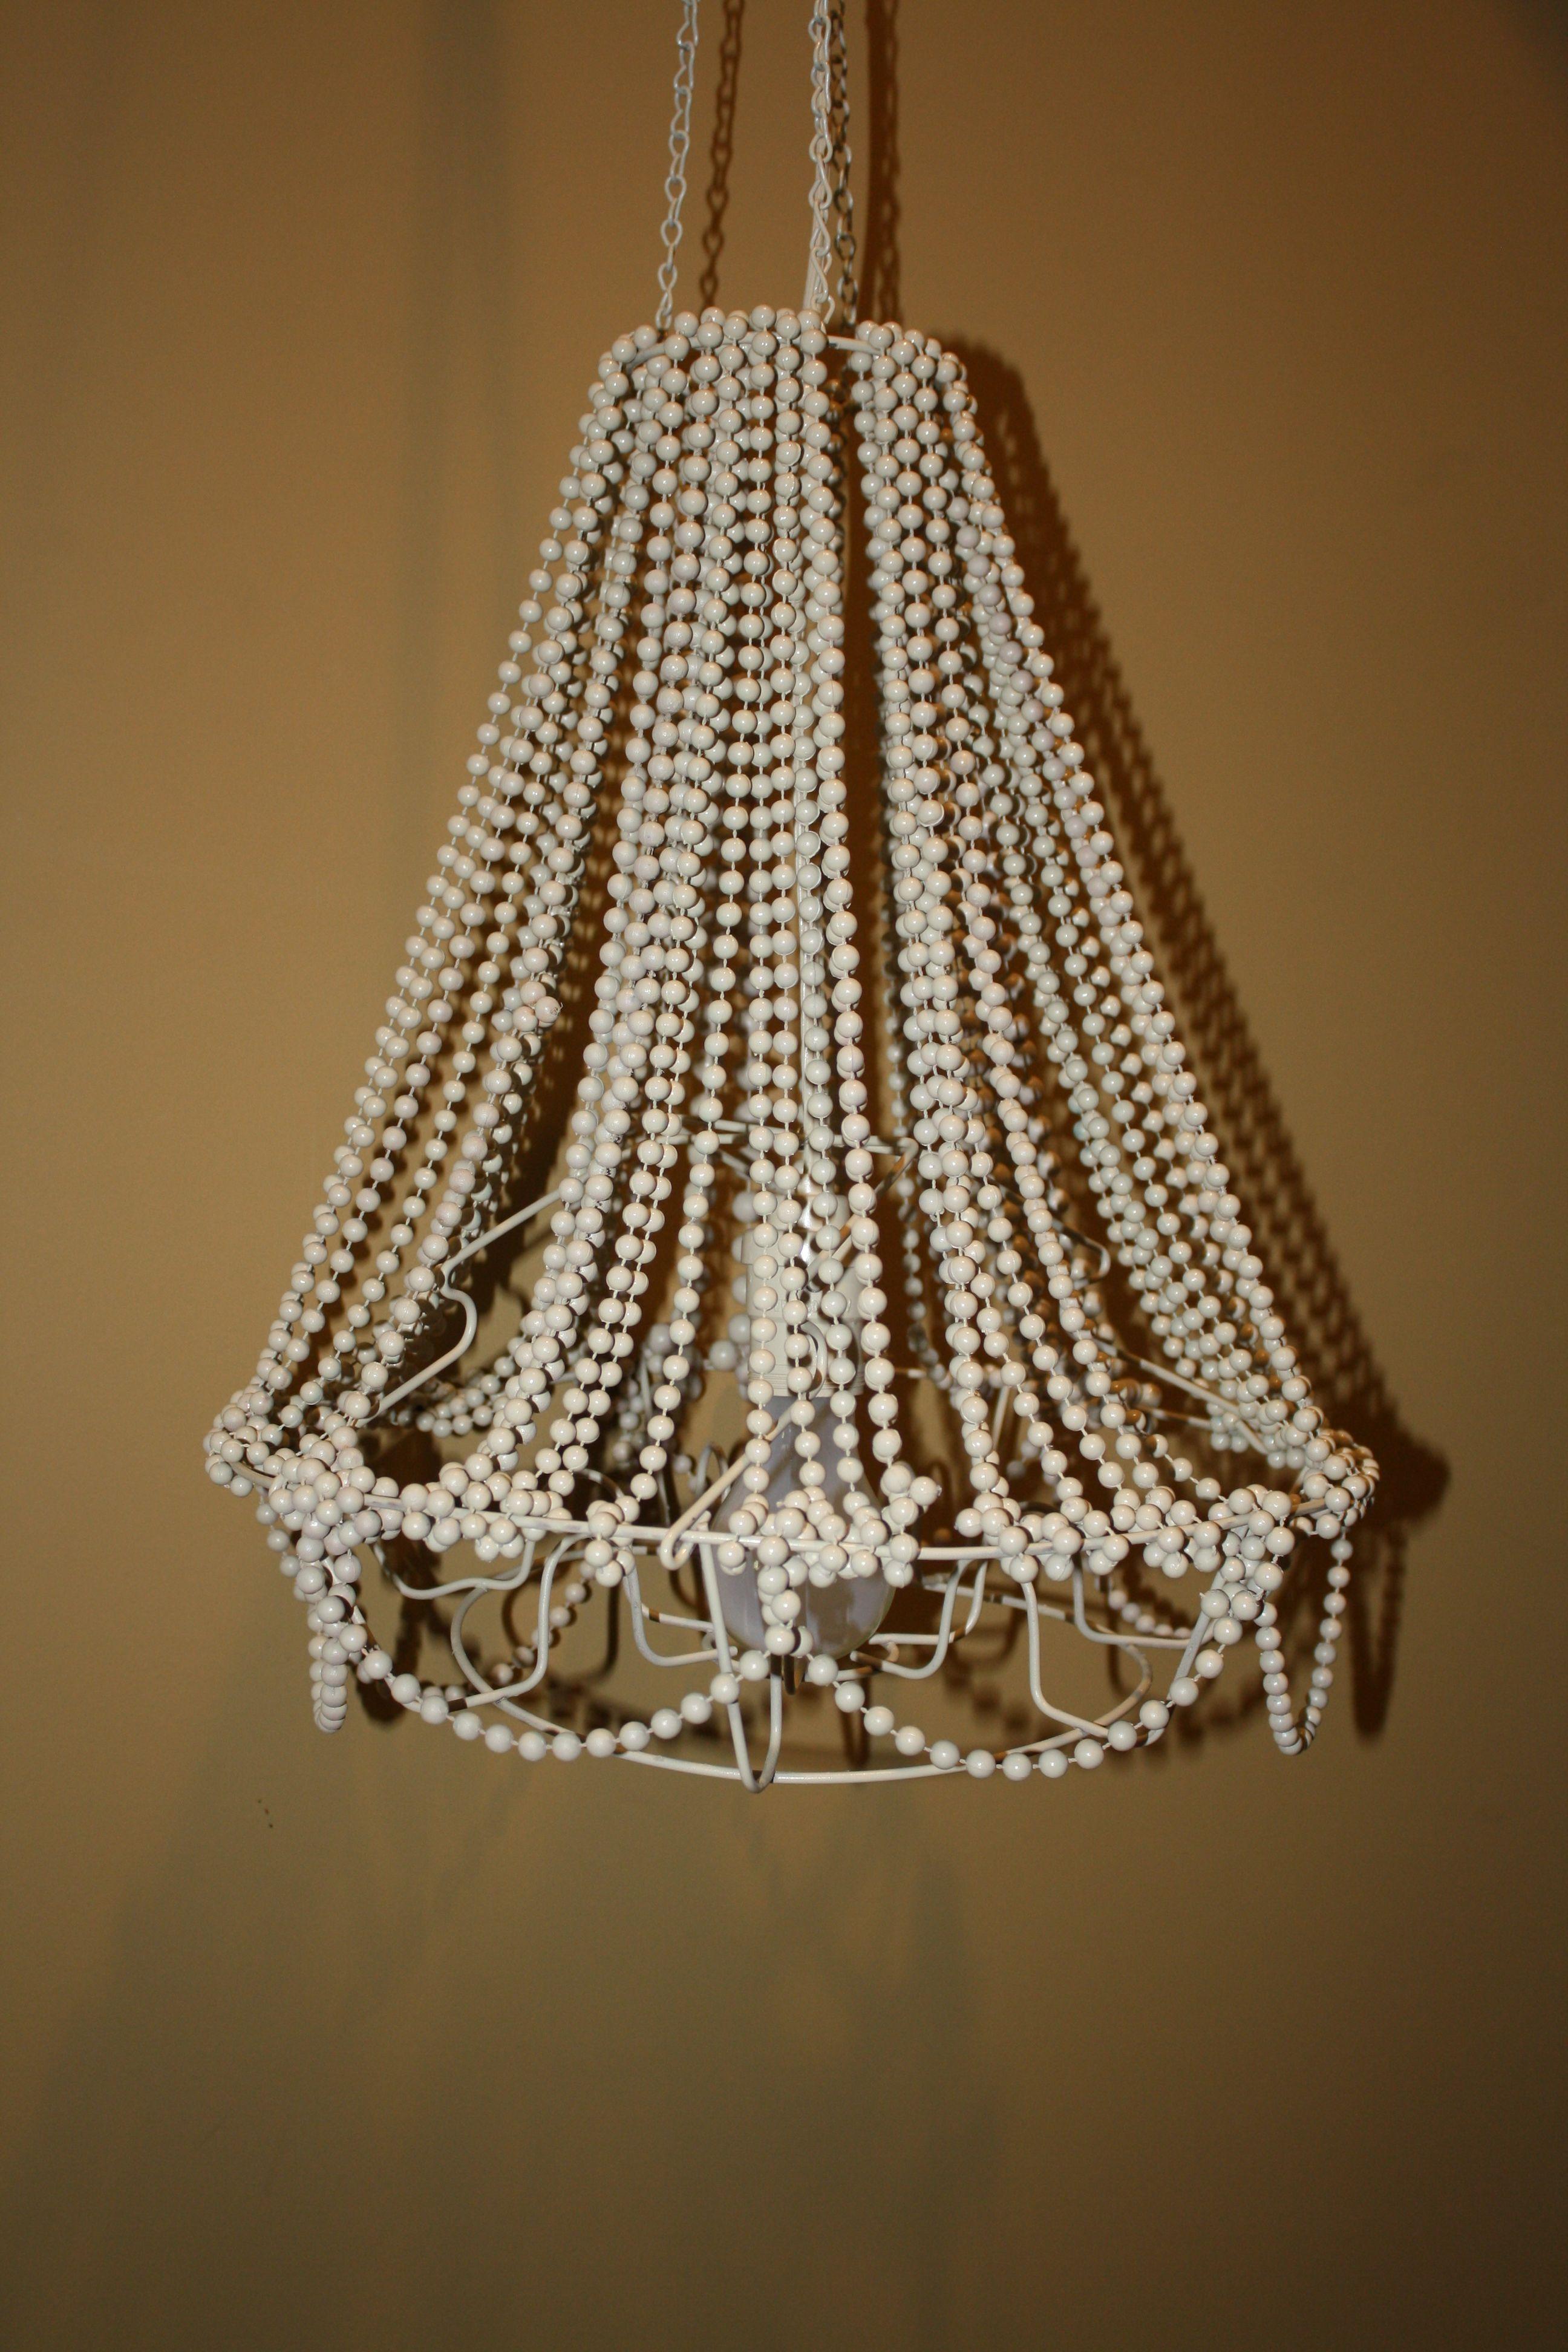 Diy chandelier canning rack mardi gras beads light socket diy chandelier canning rack mardi gras beads light socket spray paint arubaitofo Choice Image